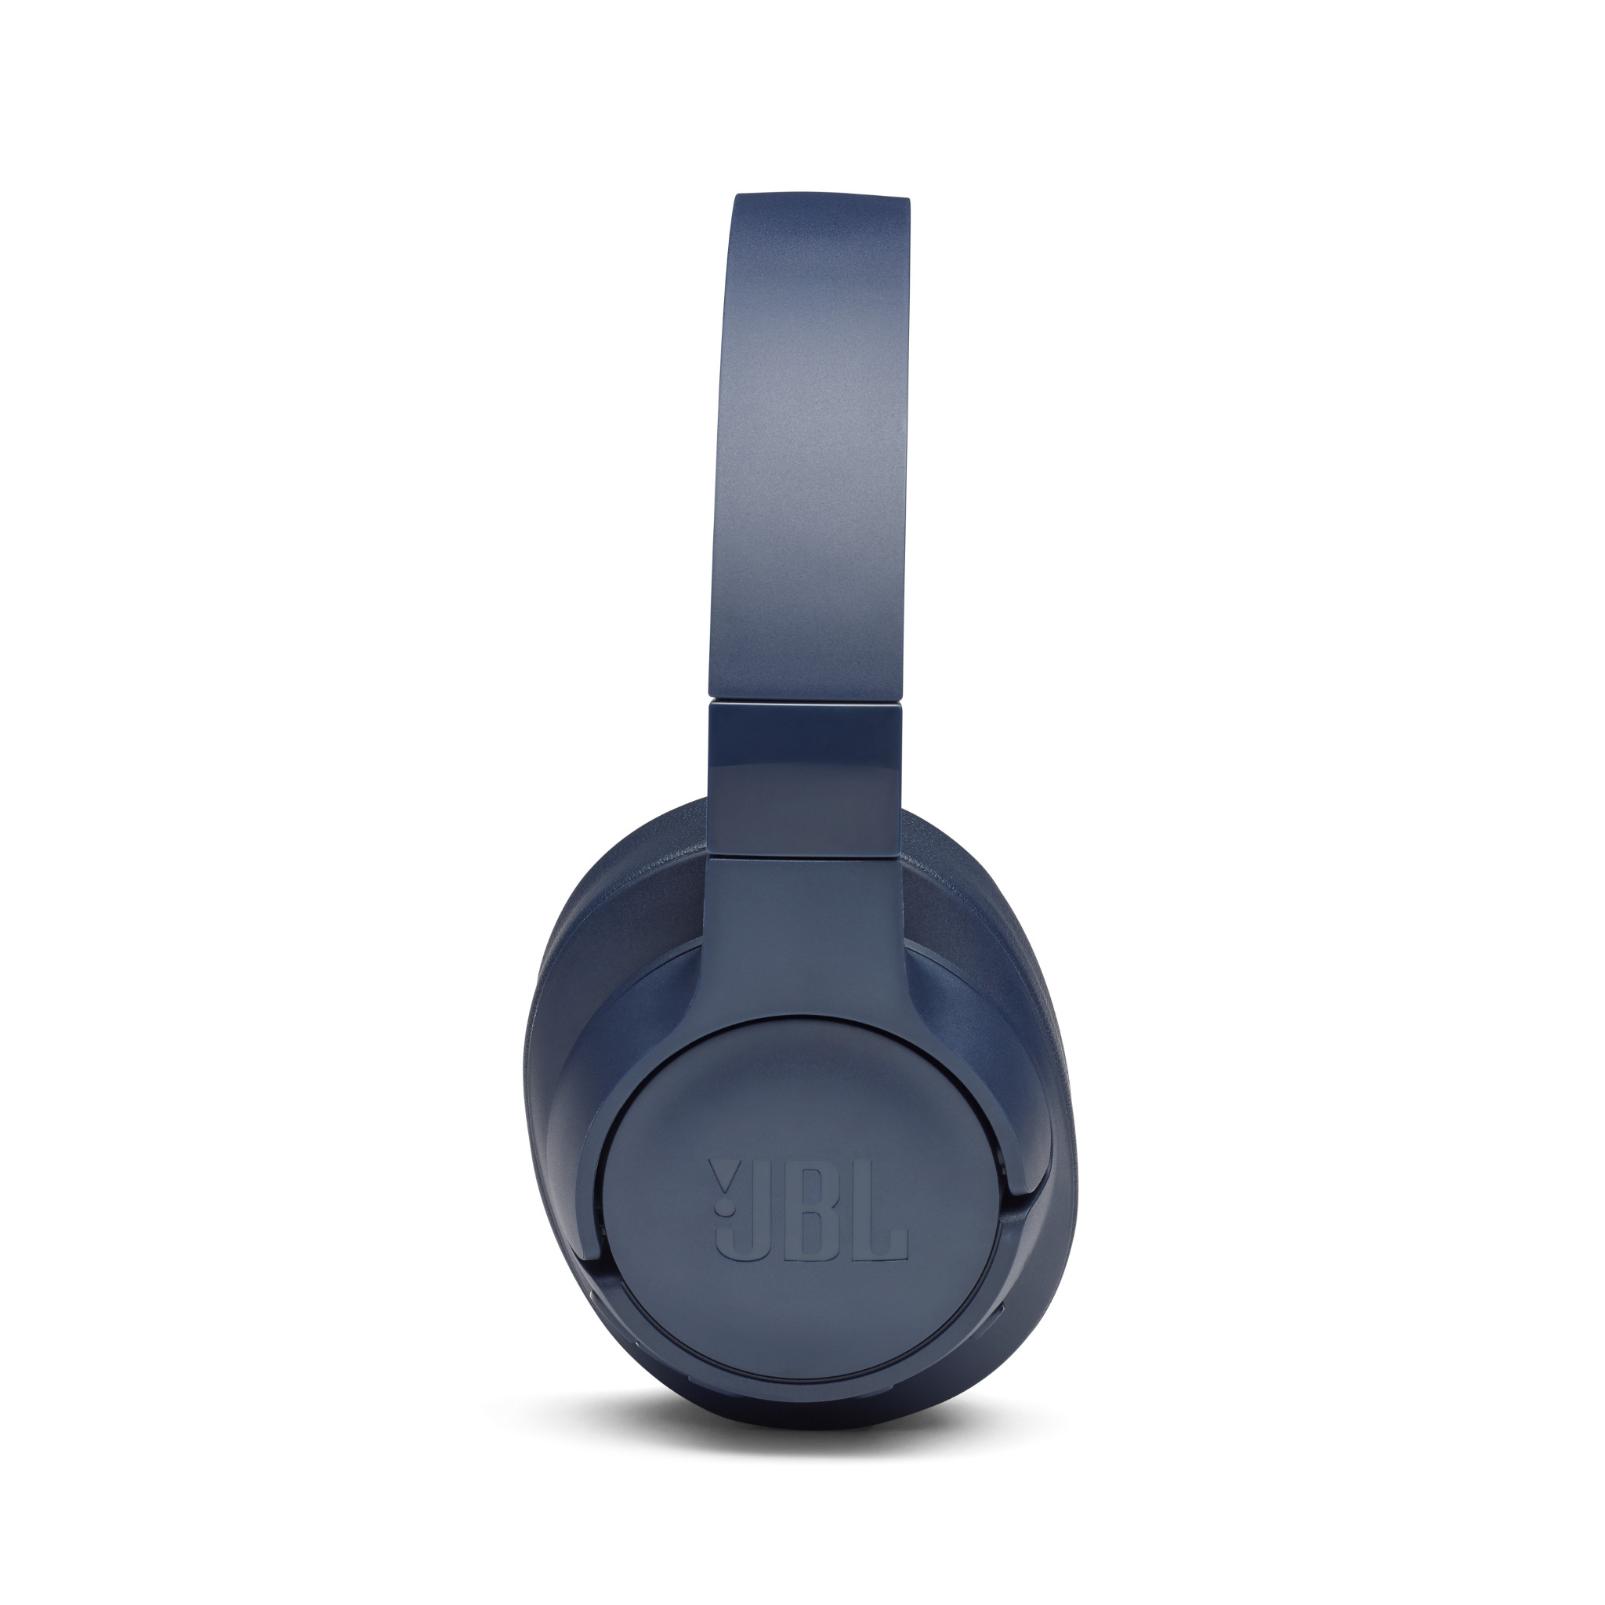 JBL TUNE 750BTNC - Blue - Wireless Over-Ear ANC Headphones - Left